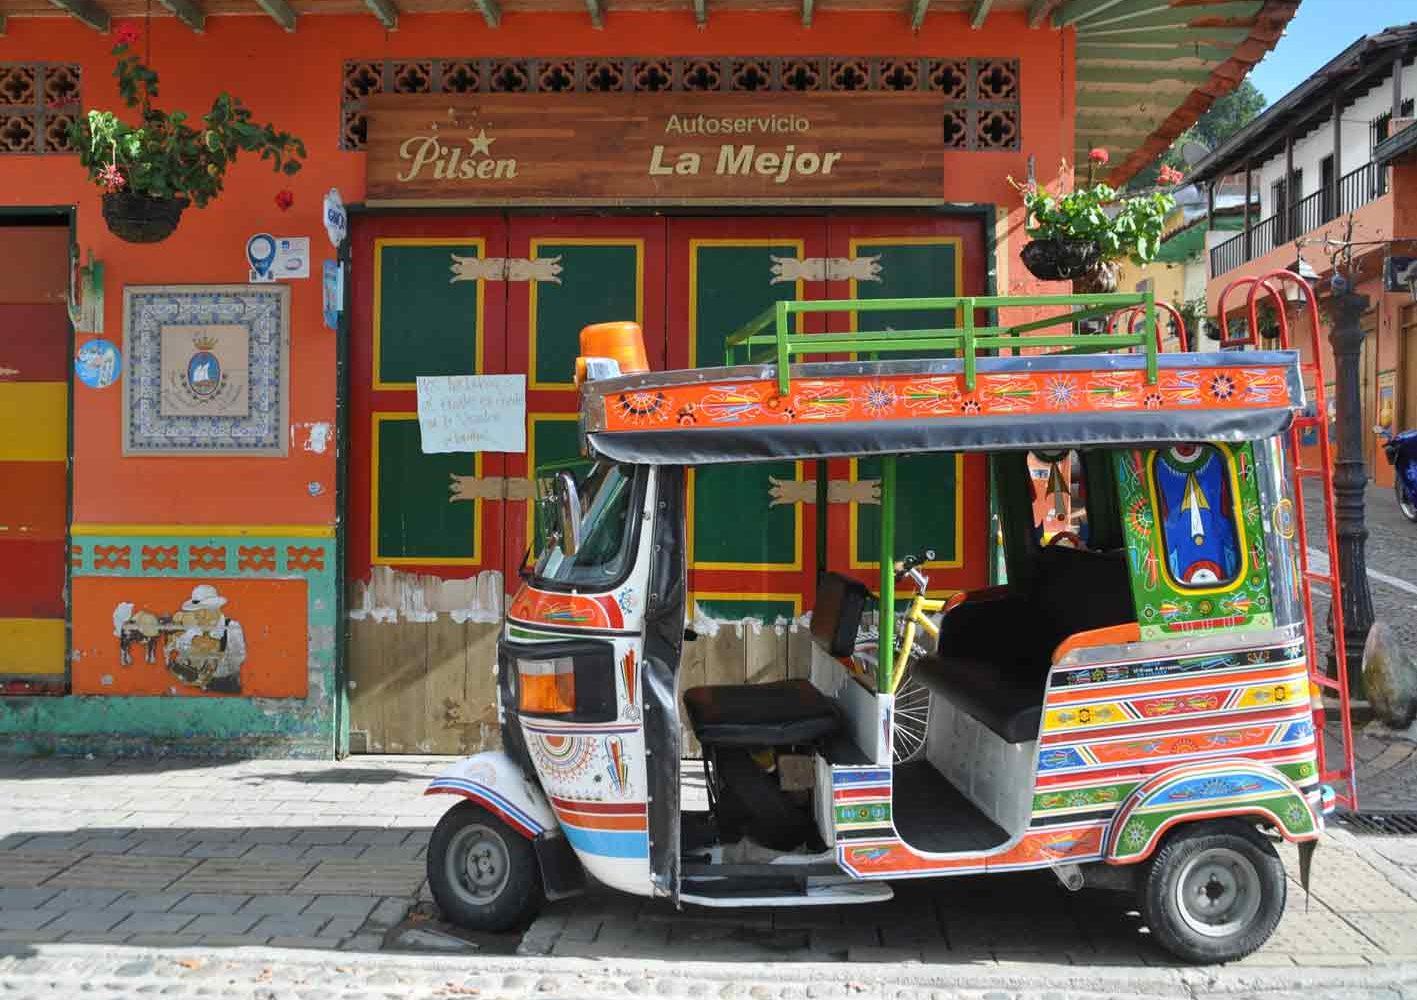 Farbige Reiseimpressionen aus Guatapé